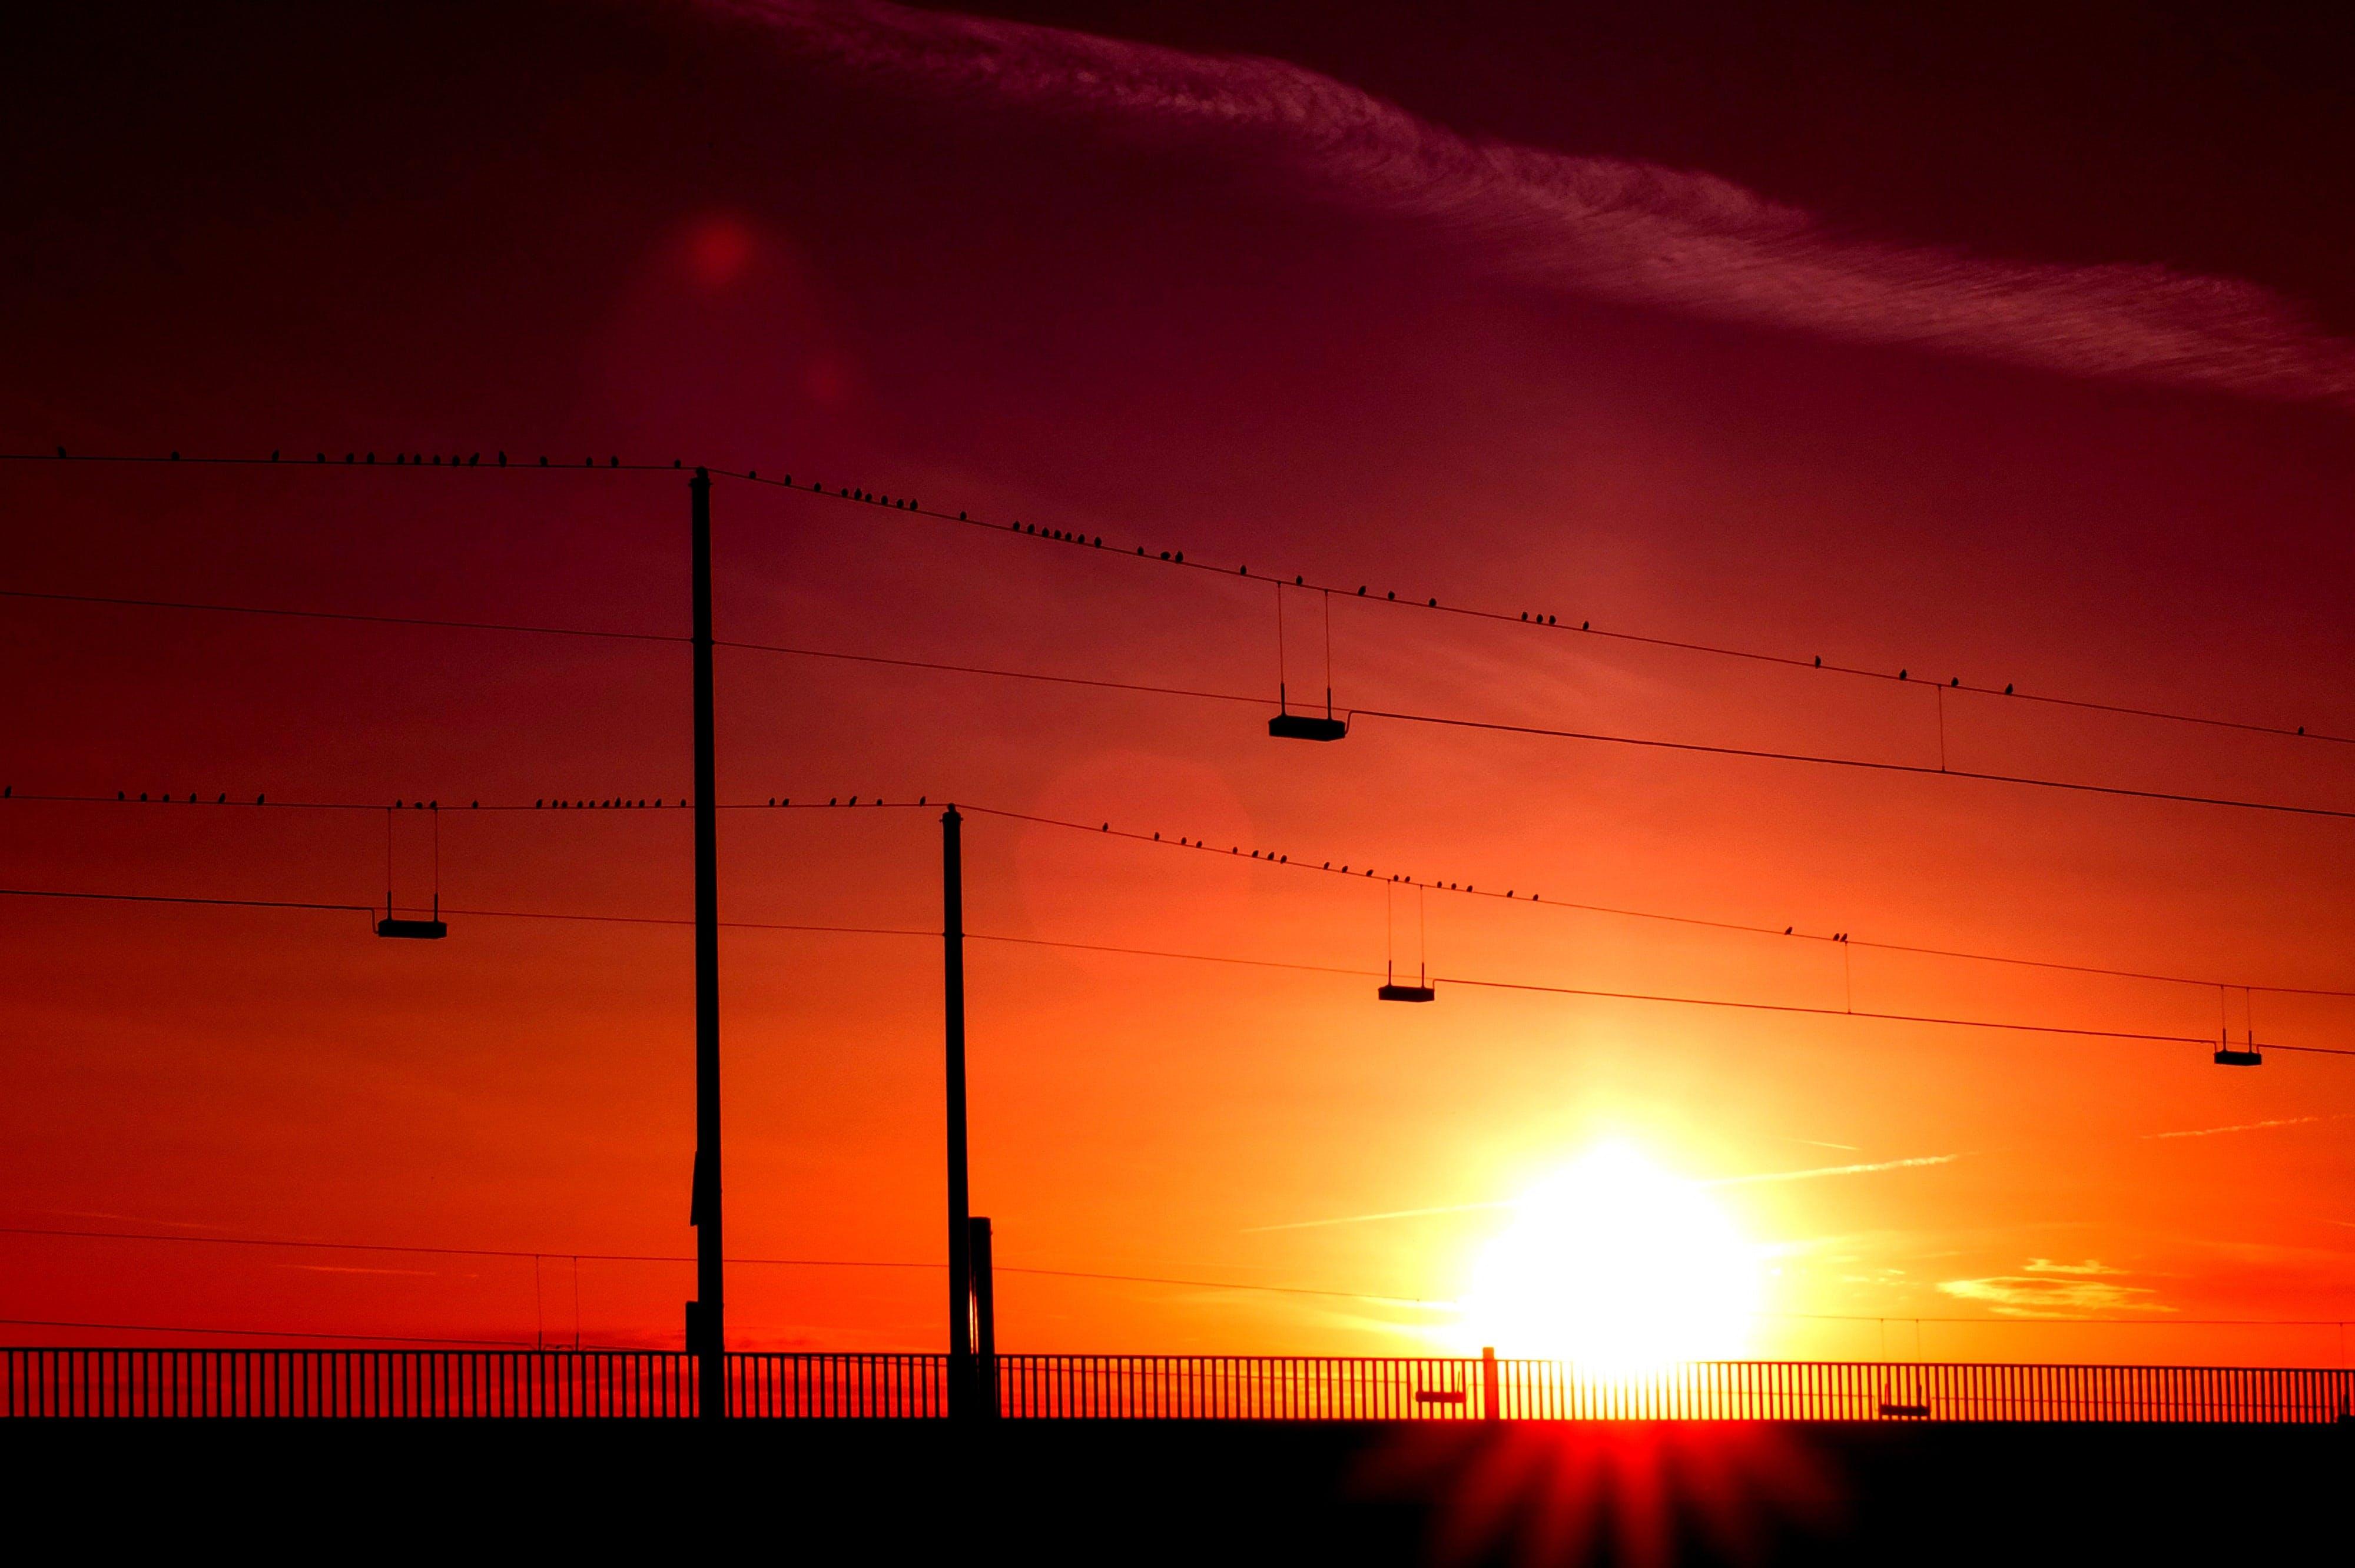 Silhouette of Posts Under Orange Sunset